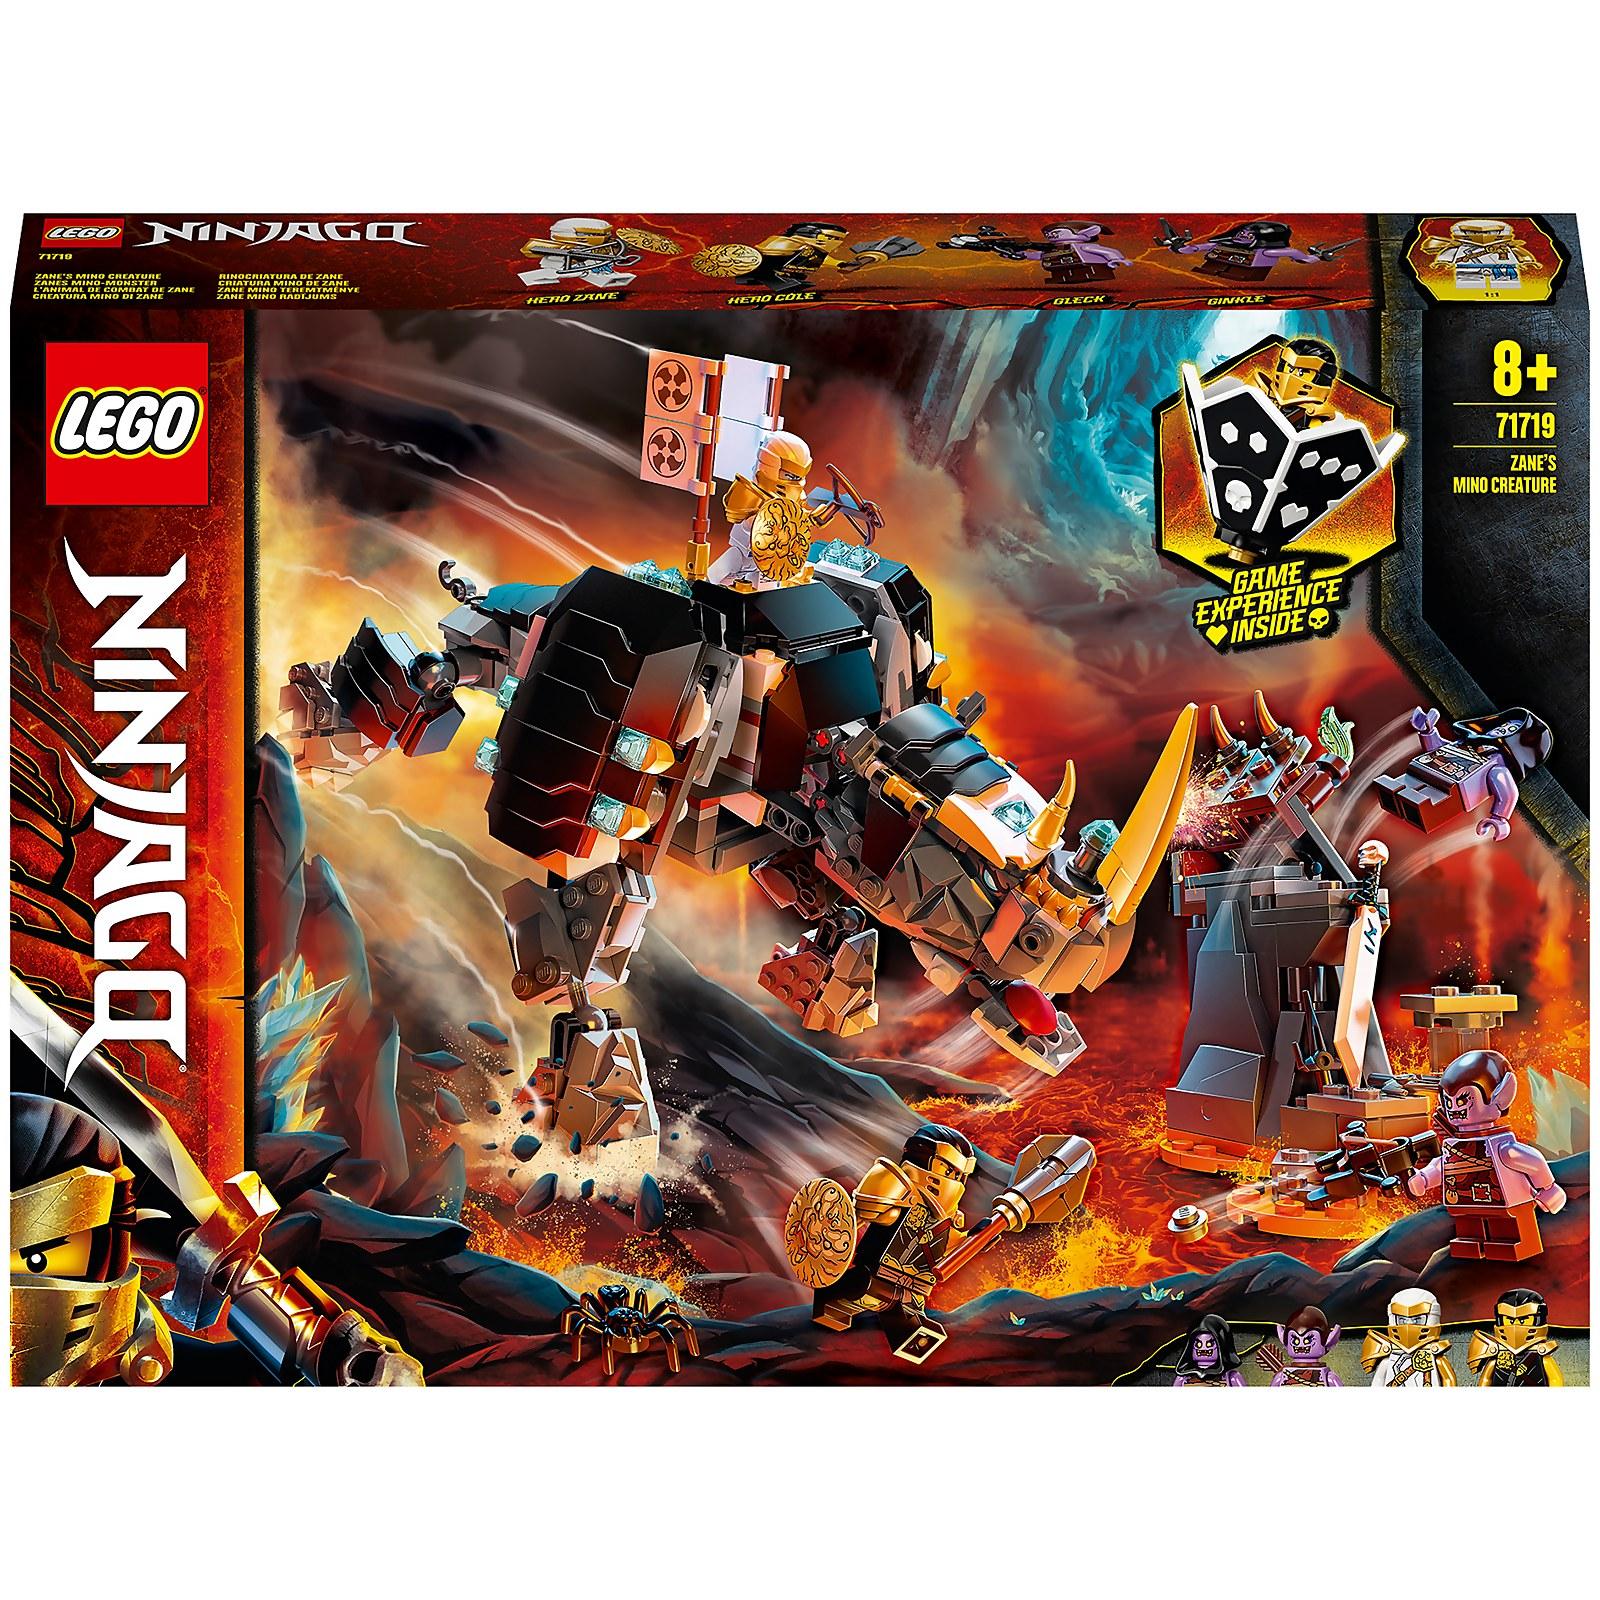 Image of 71719 LEGO® NINJAGO Zanes Mino Monster